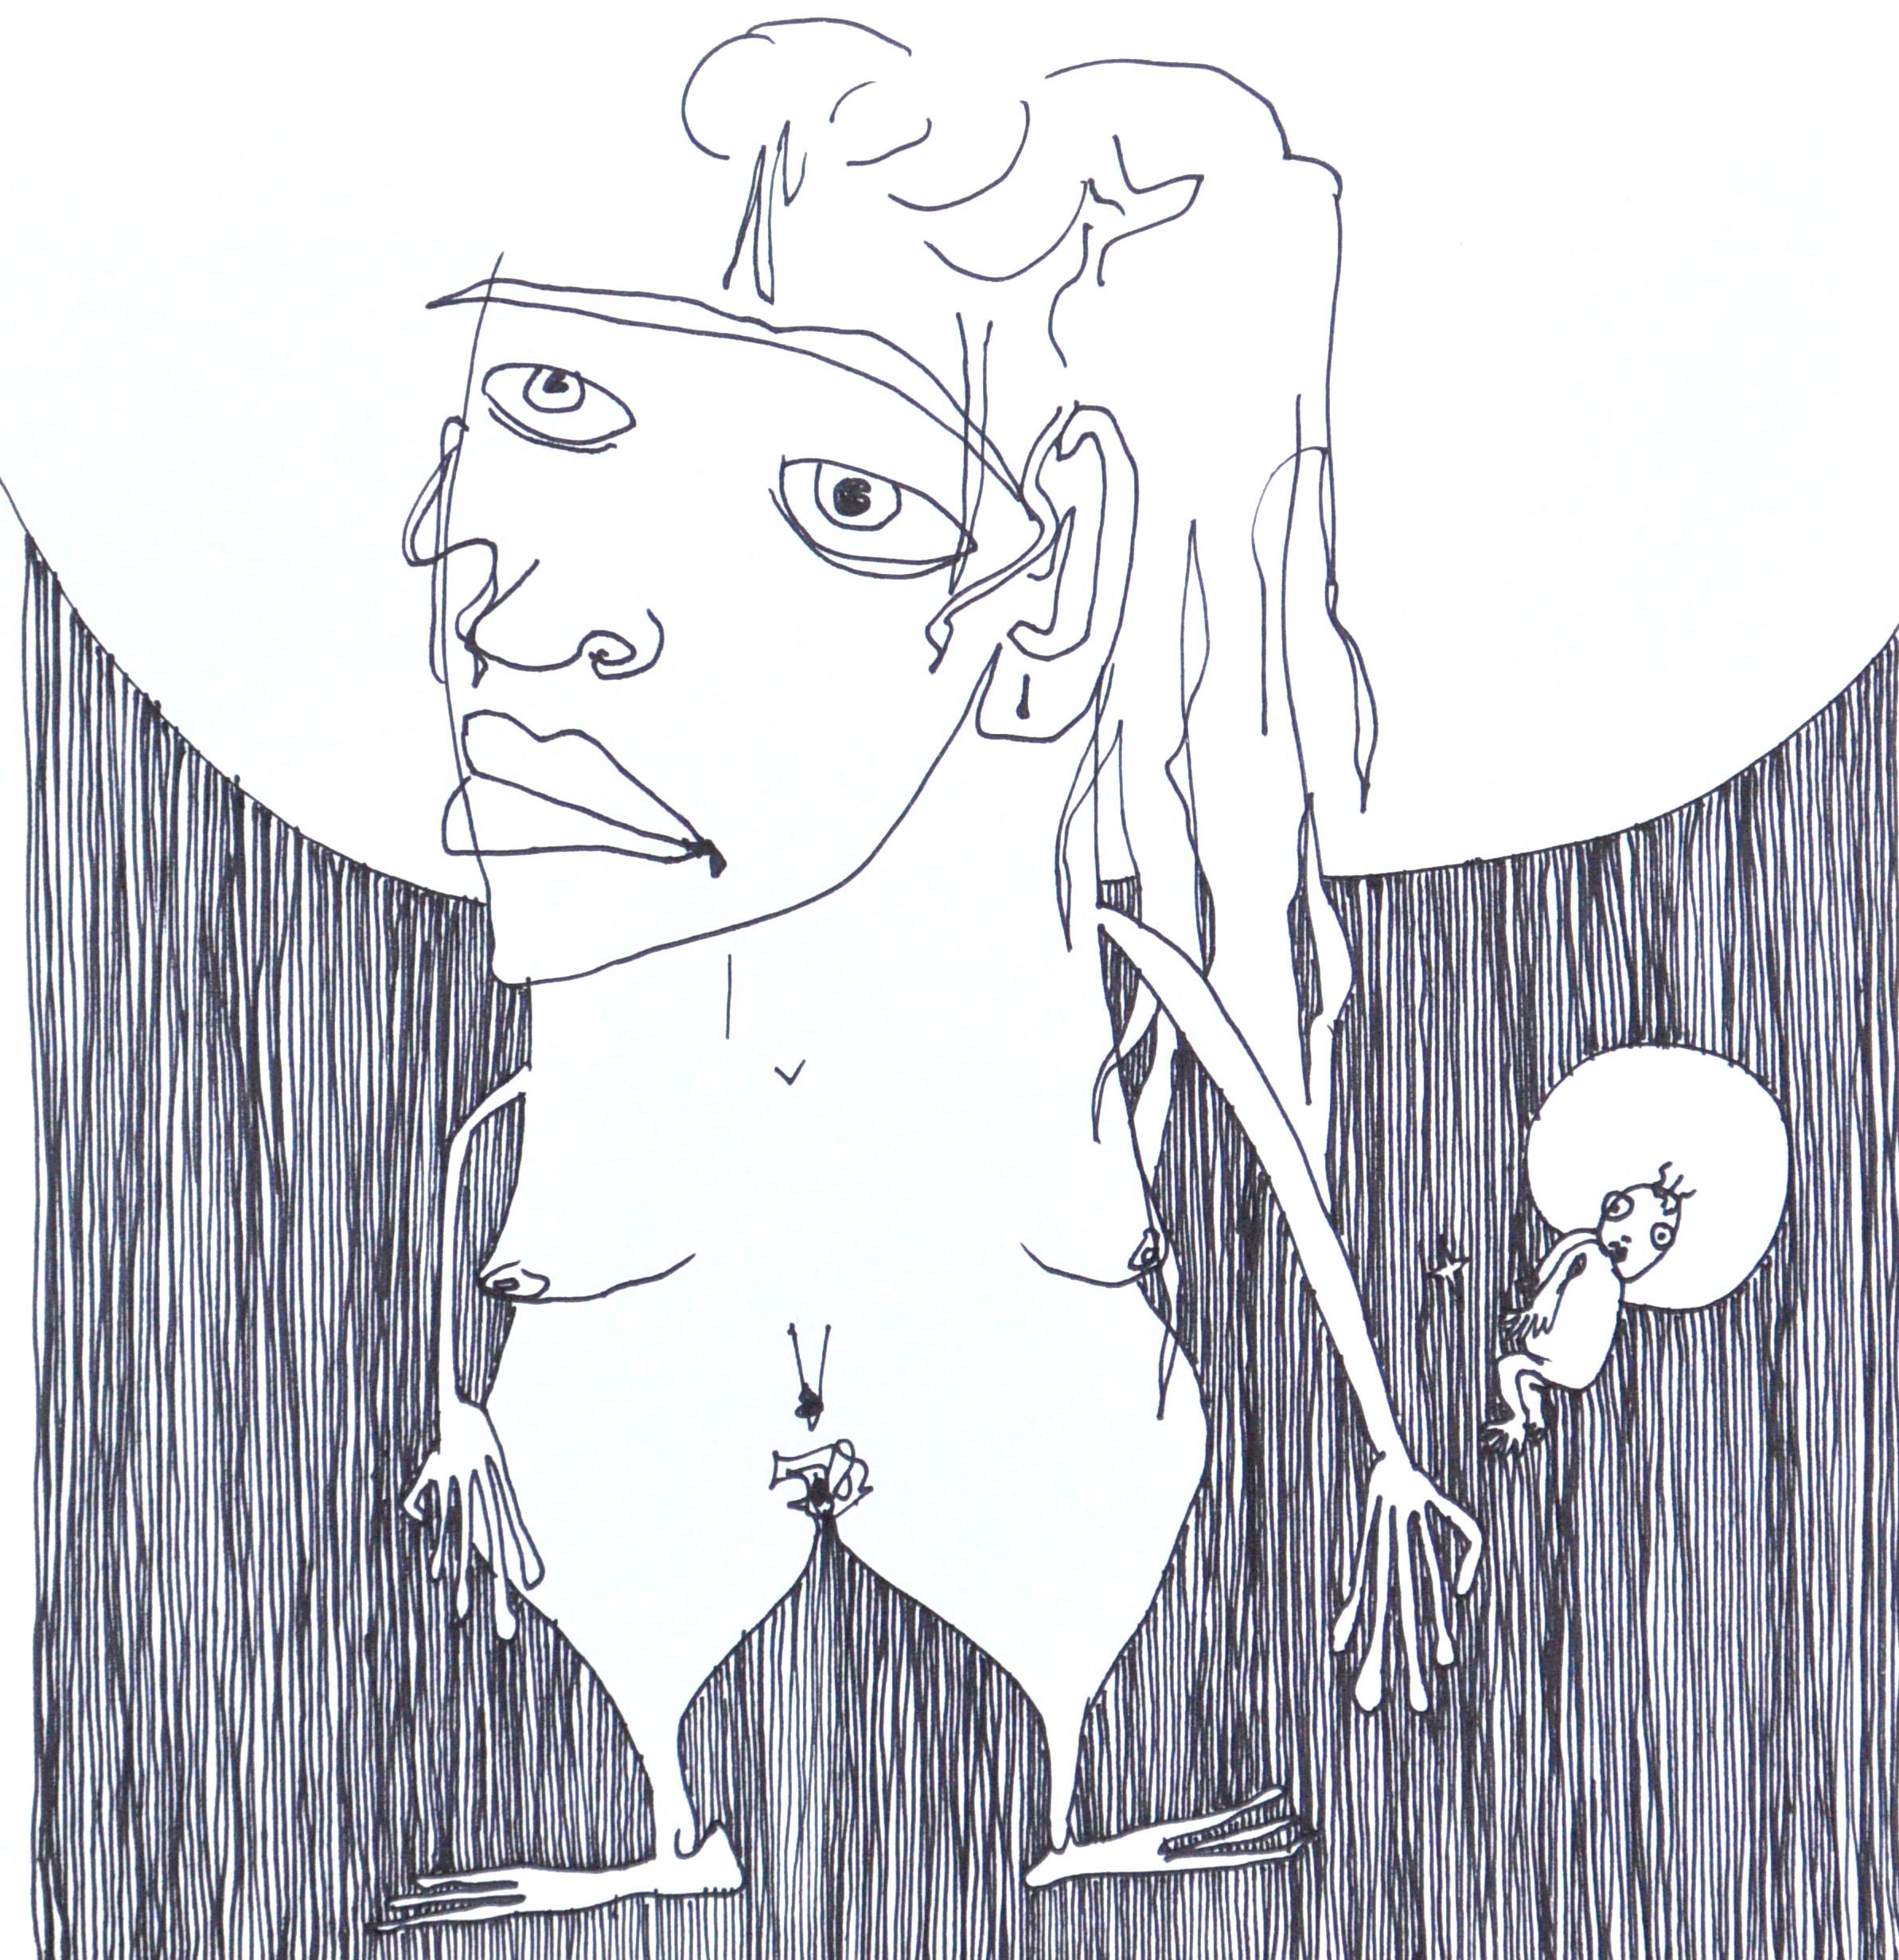 Wife of poet , 2017. Ink. 7.5 x 7.5 in.